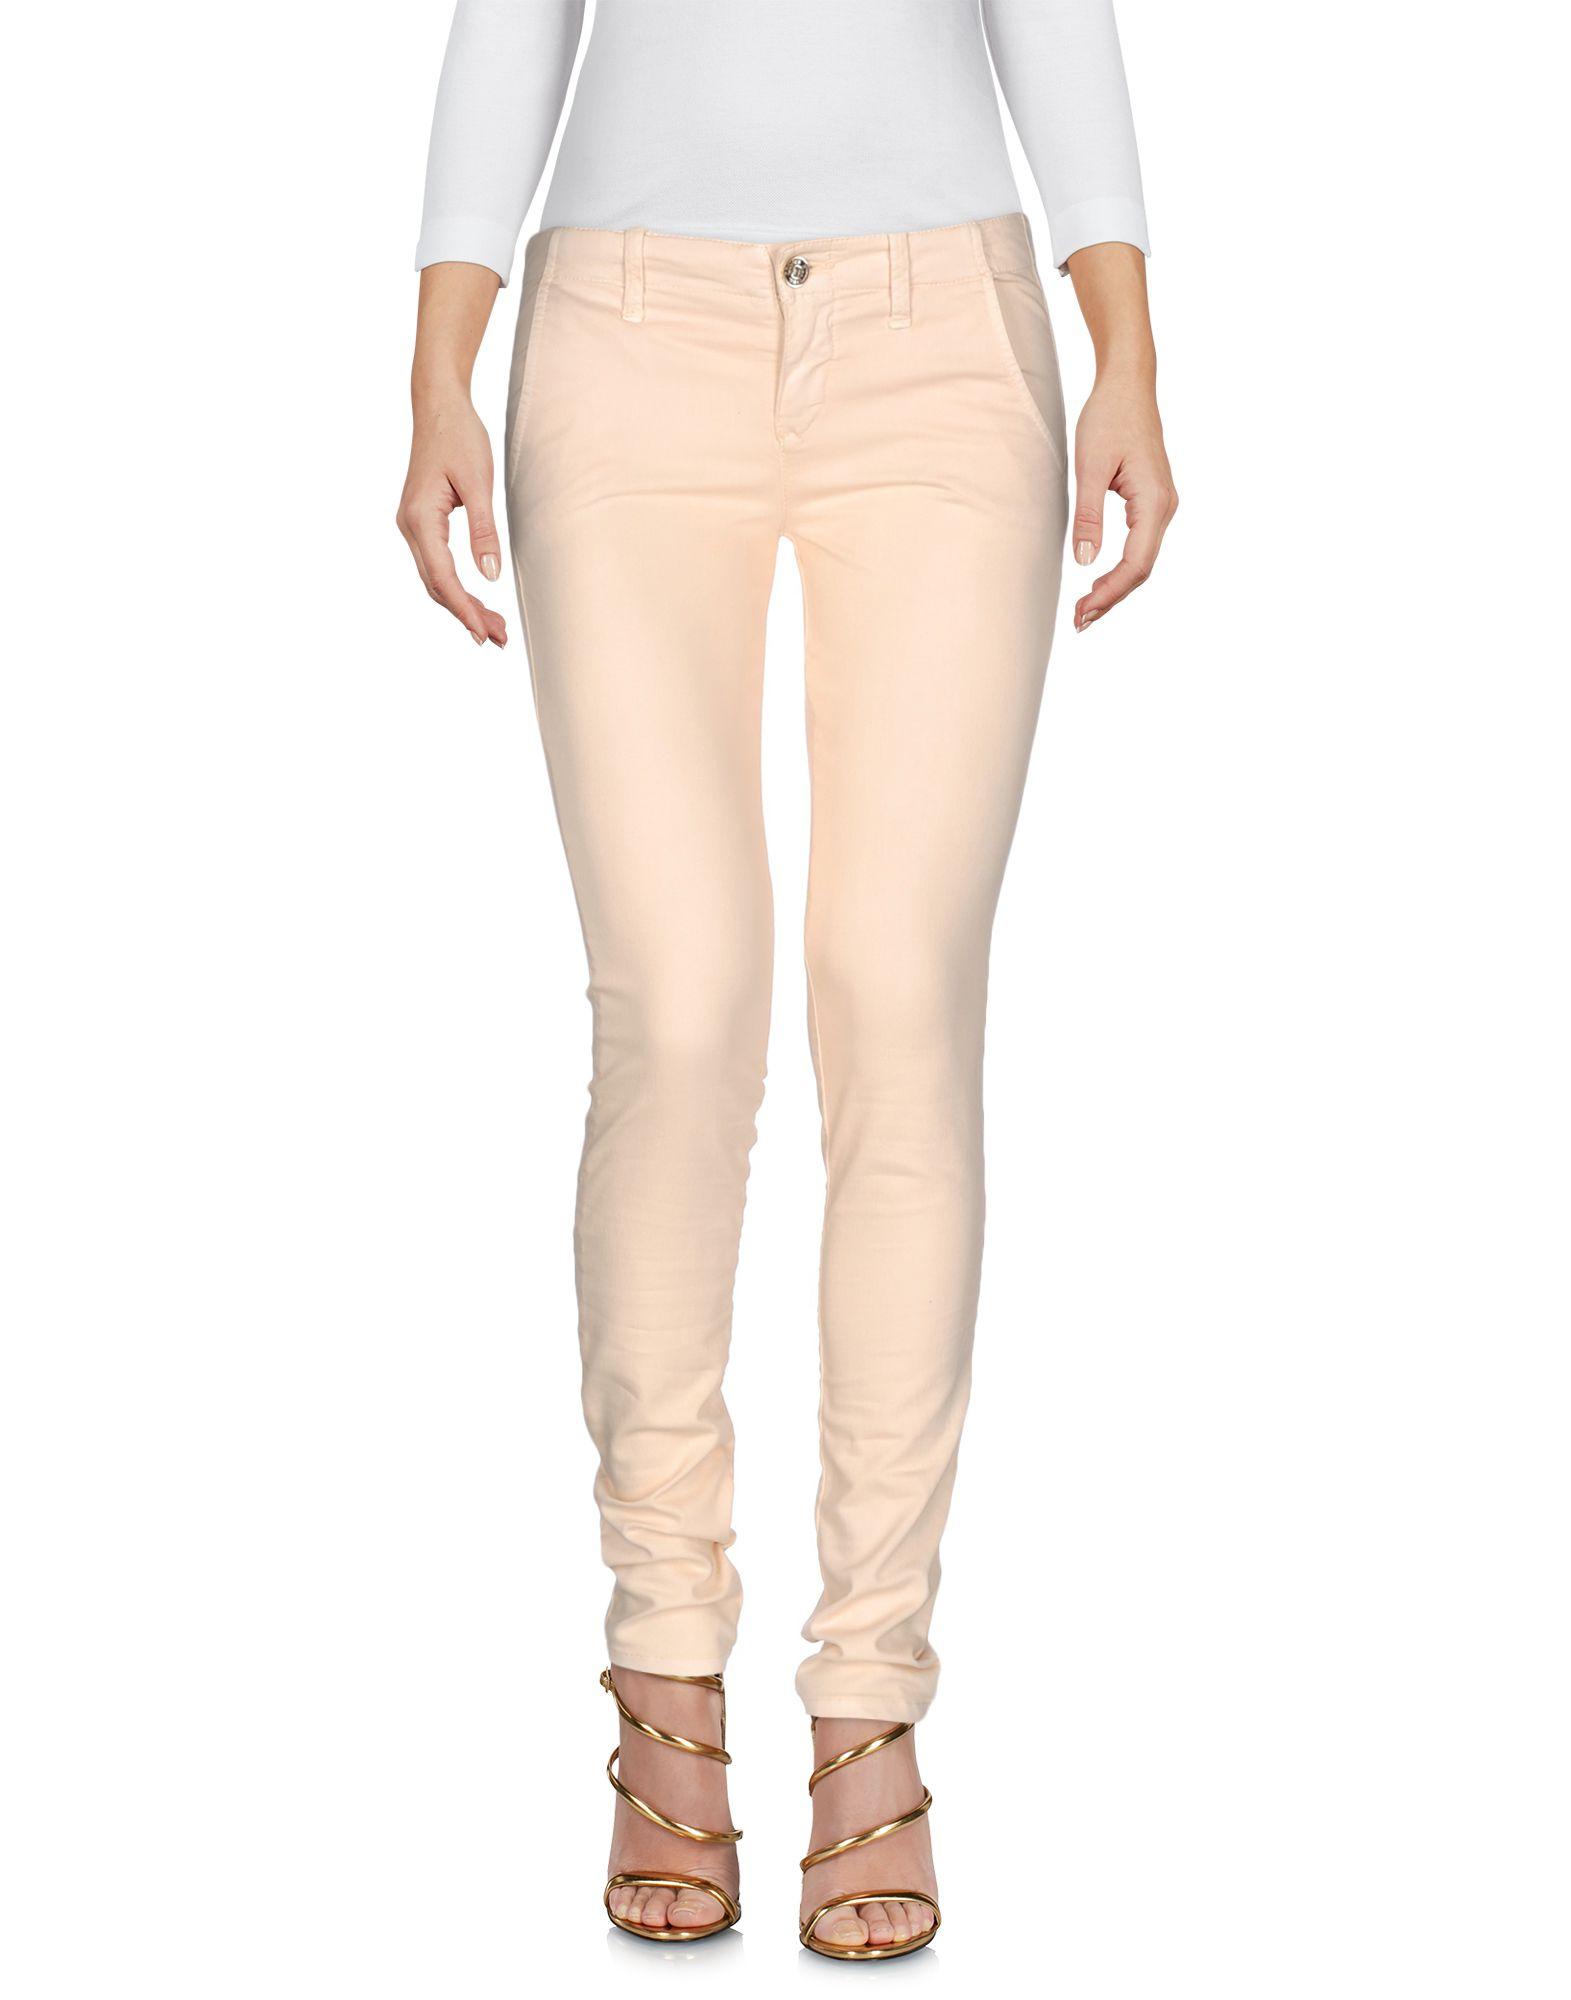 BLUGIRL FOLIES Damen Jeanshose Farbe Beige Größe 6